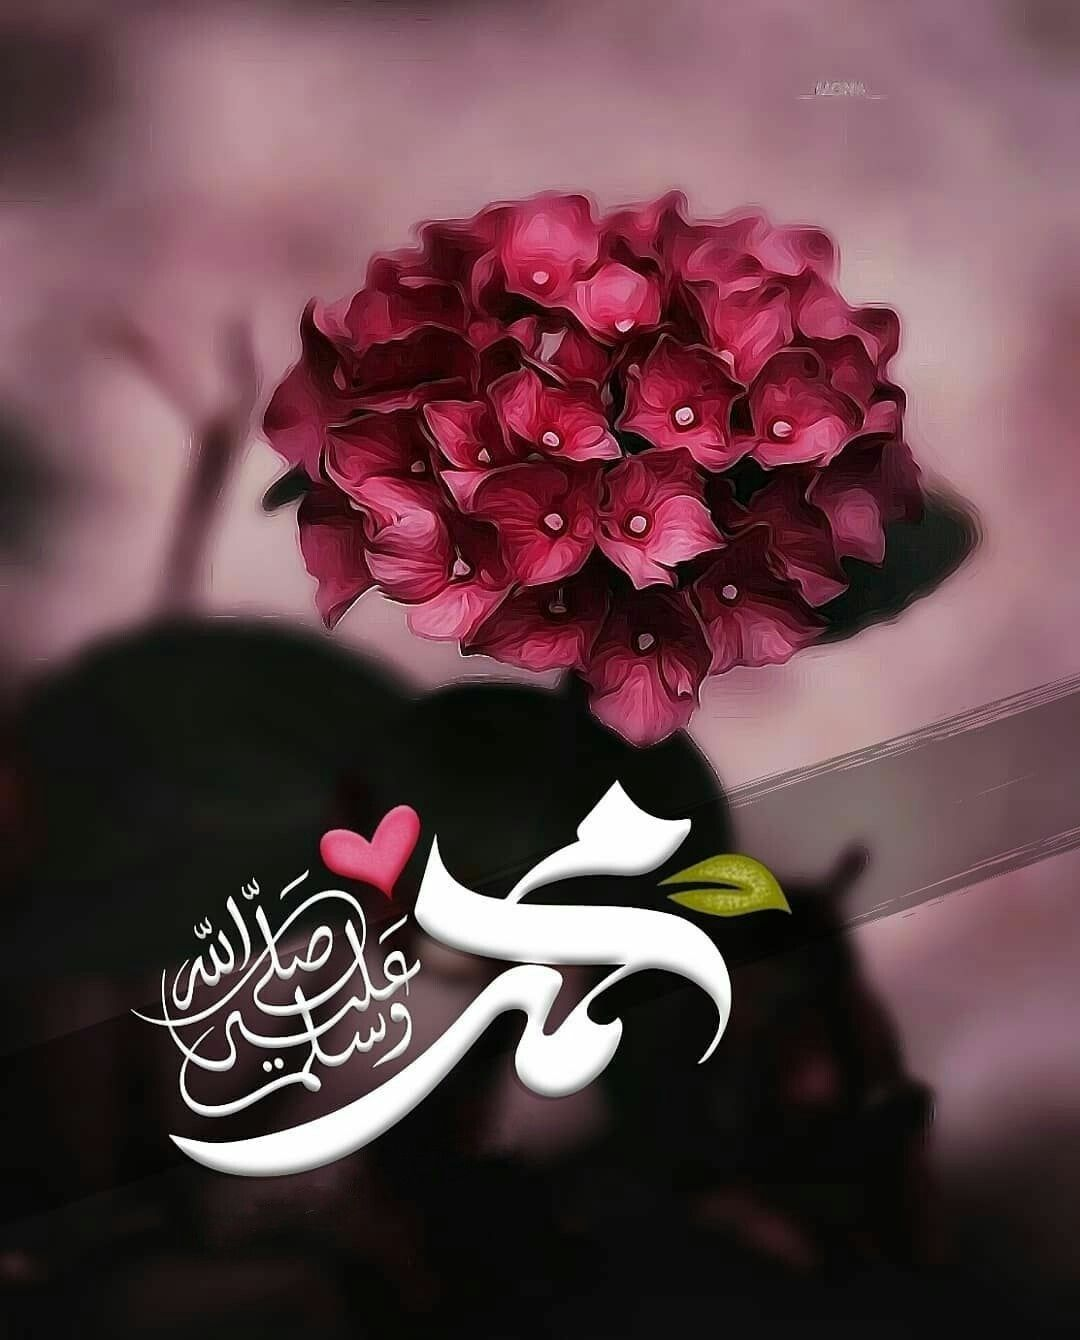 اجمل دعاء مكتوب بحث عن الدعاء بالصور Islamic Images Front Door Paint Colors Cooking Recipes Desserts